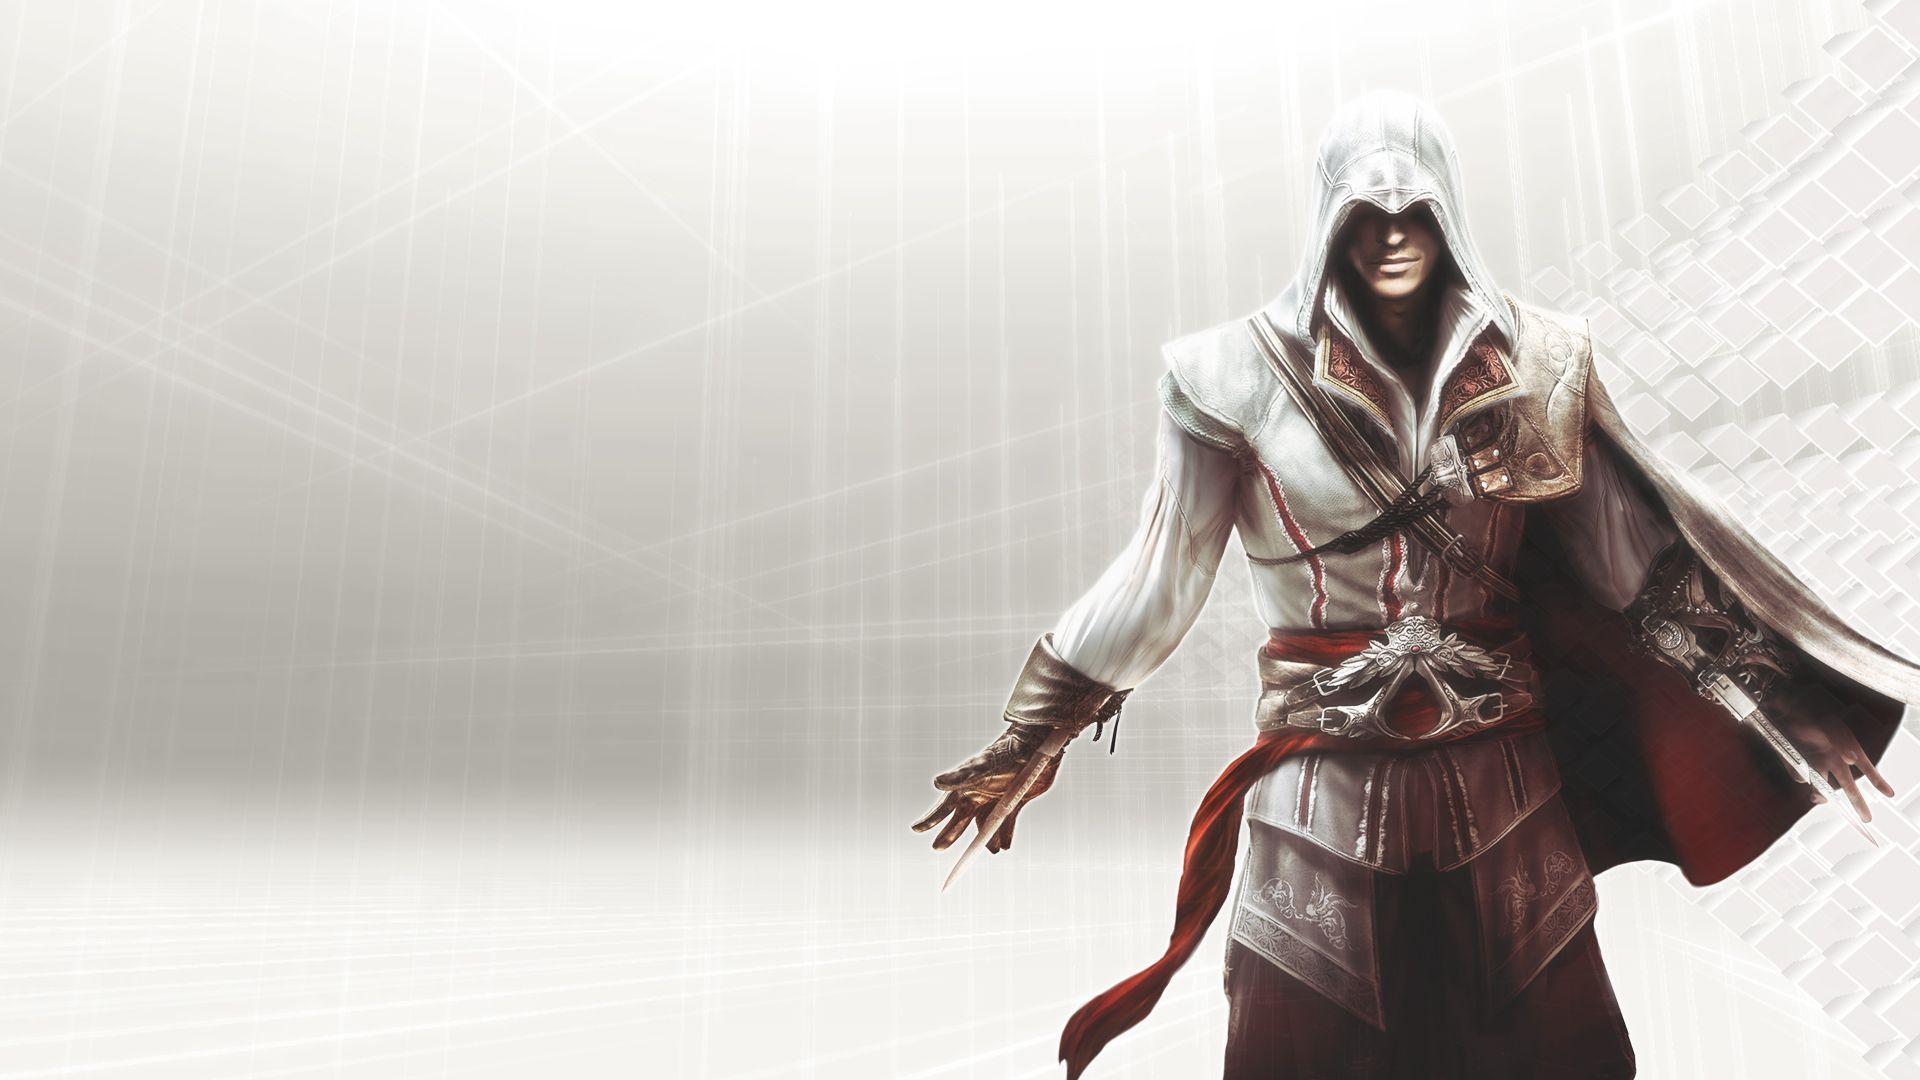 assassins creed hd wallpapers wallpaper 1024 640 assassin creed